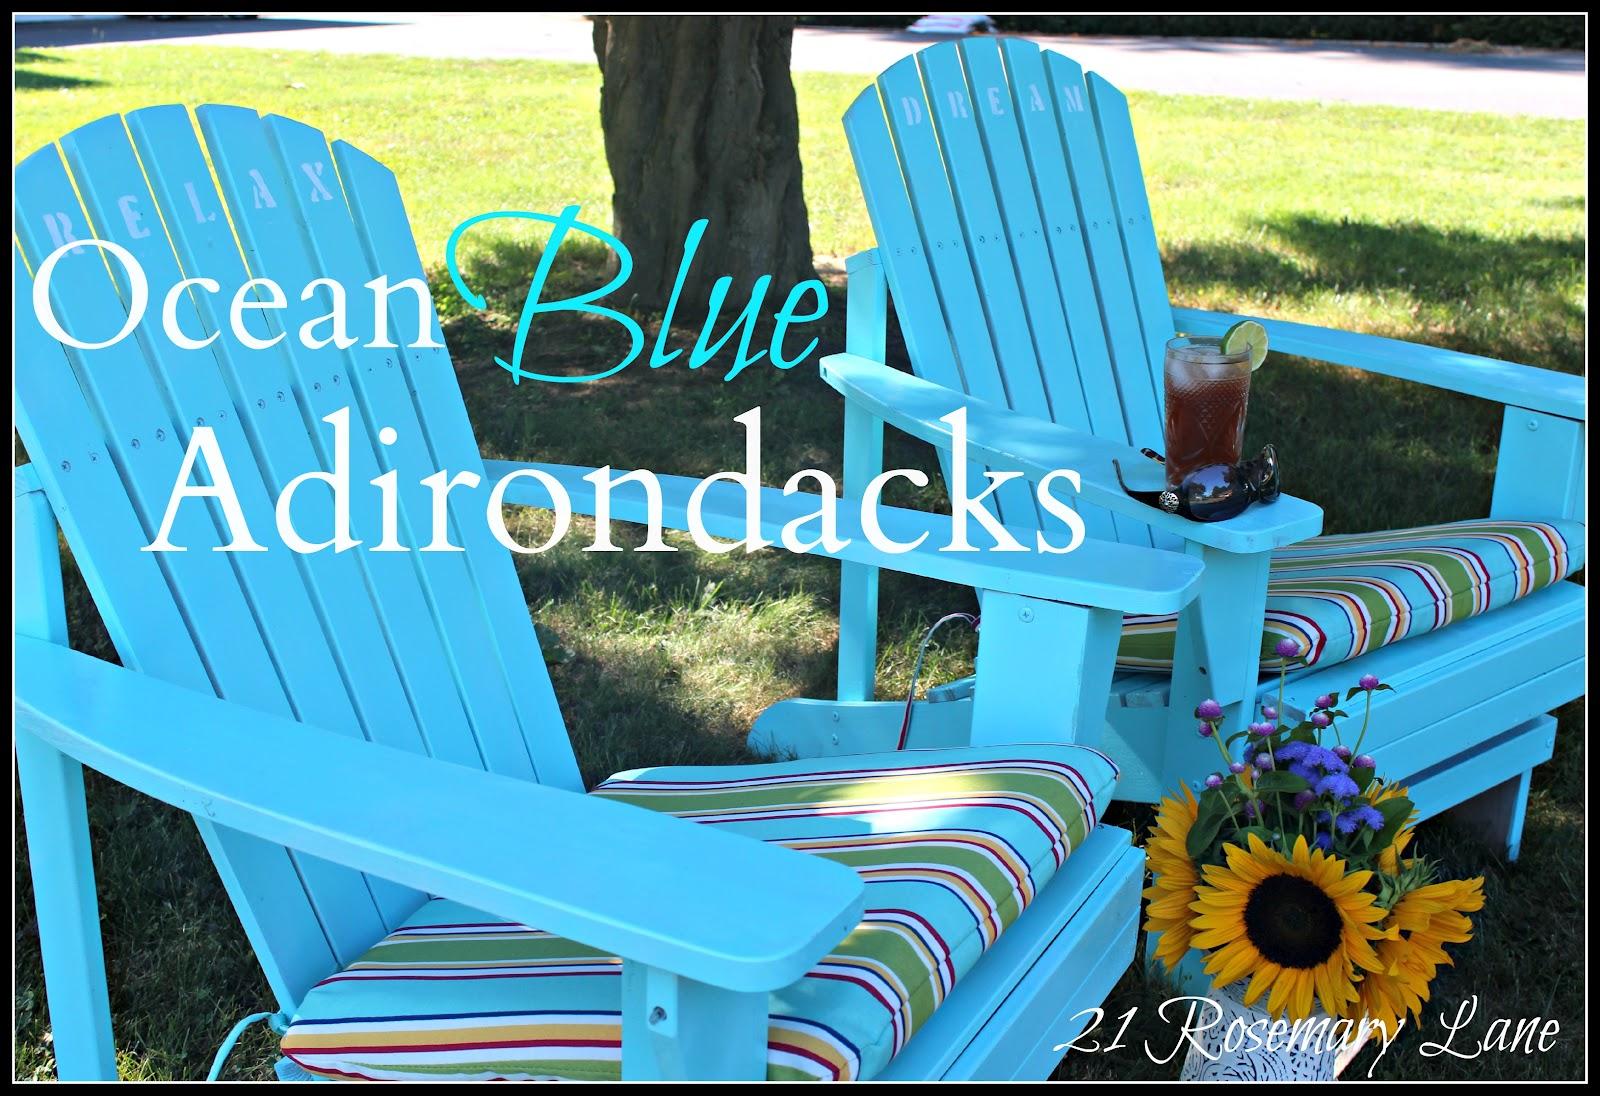 Paint For Adirondack Chairs Swing Chair Price In Bangladesh 21 Rosemary Lane My Freshly Painted